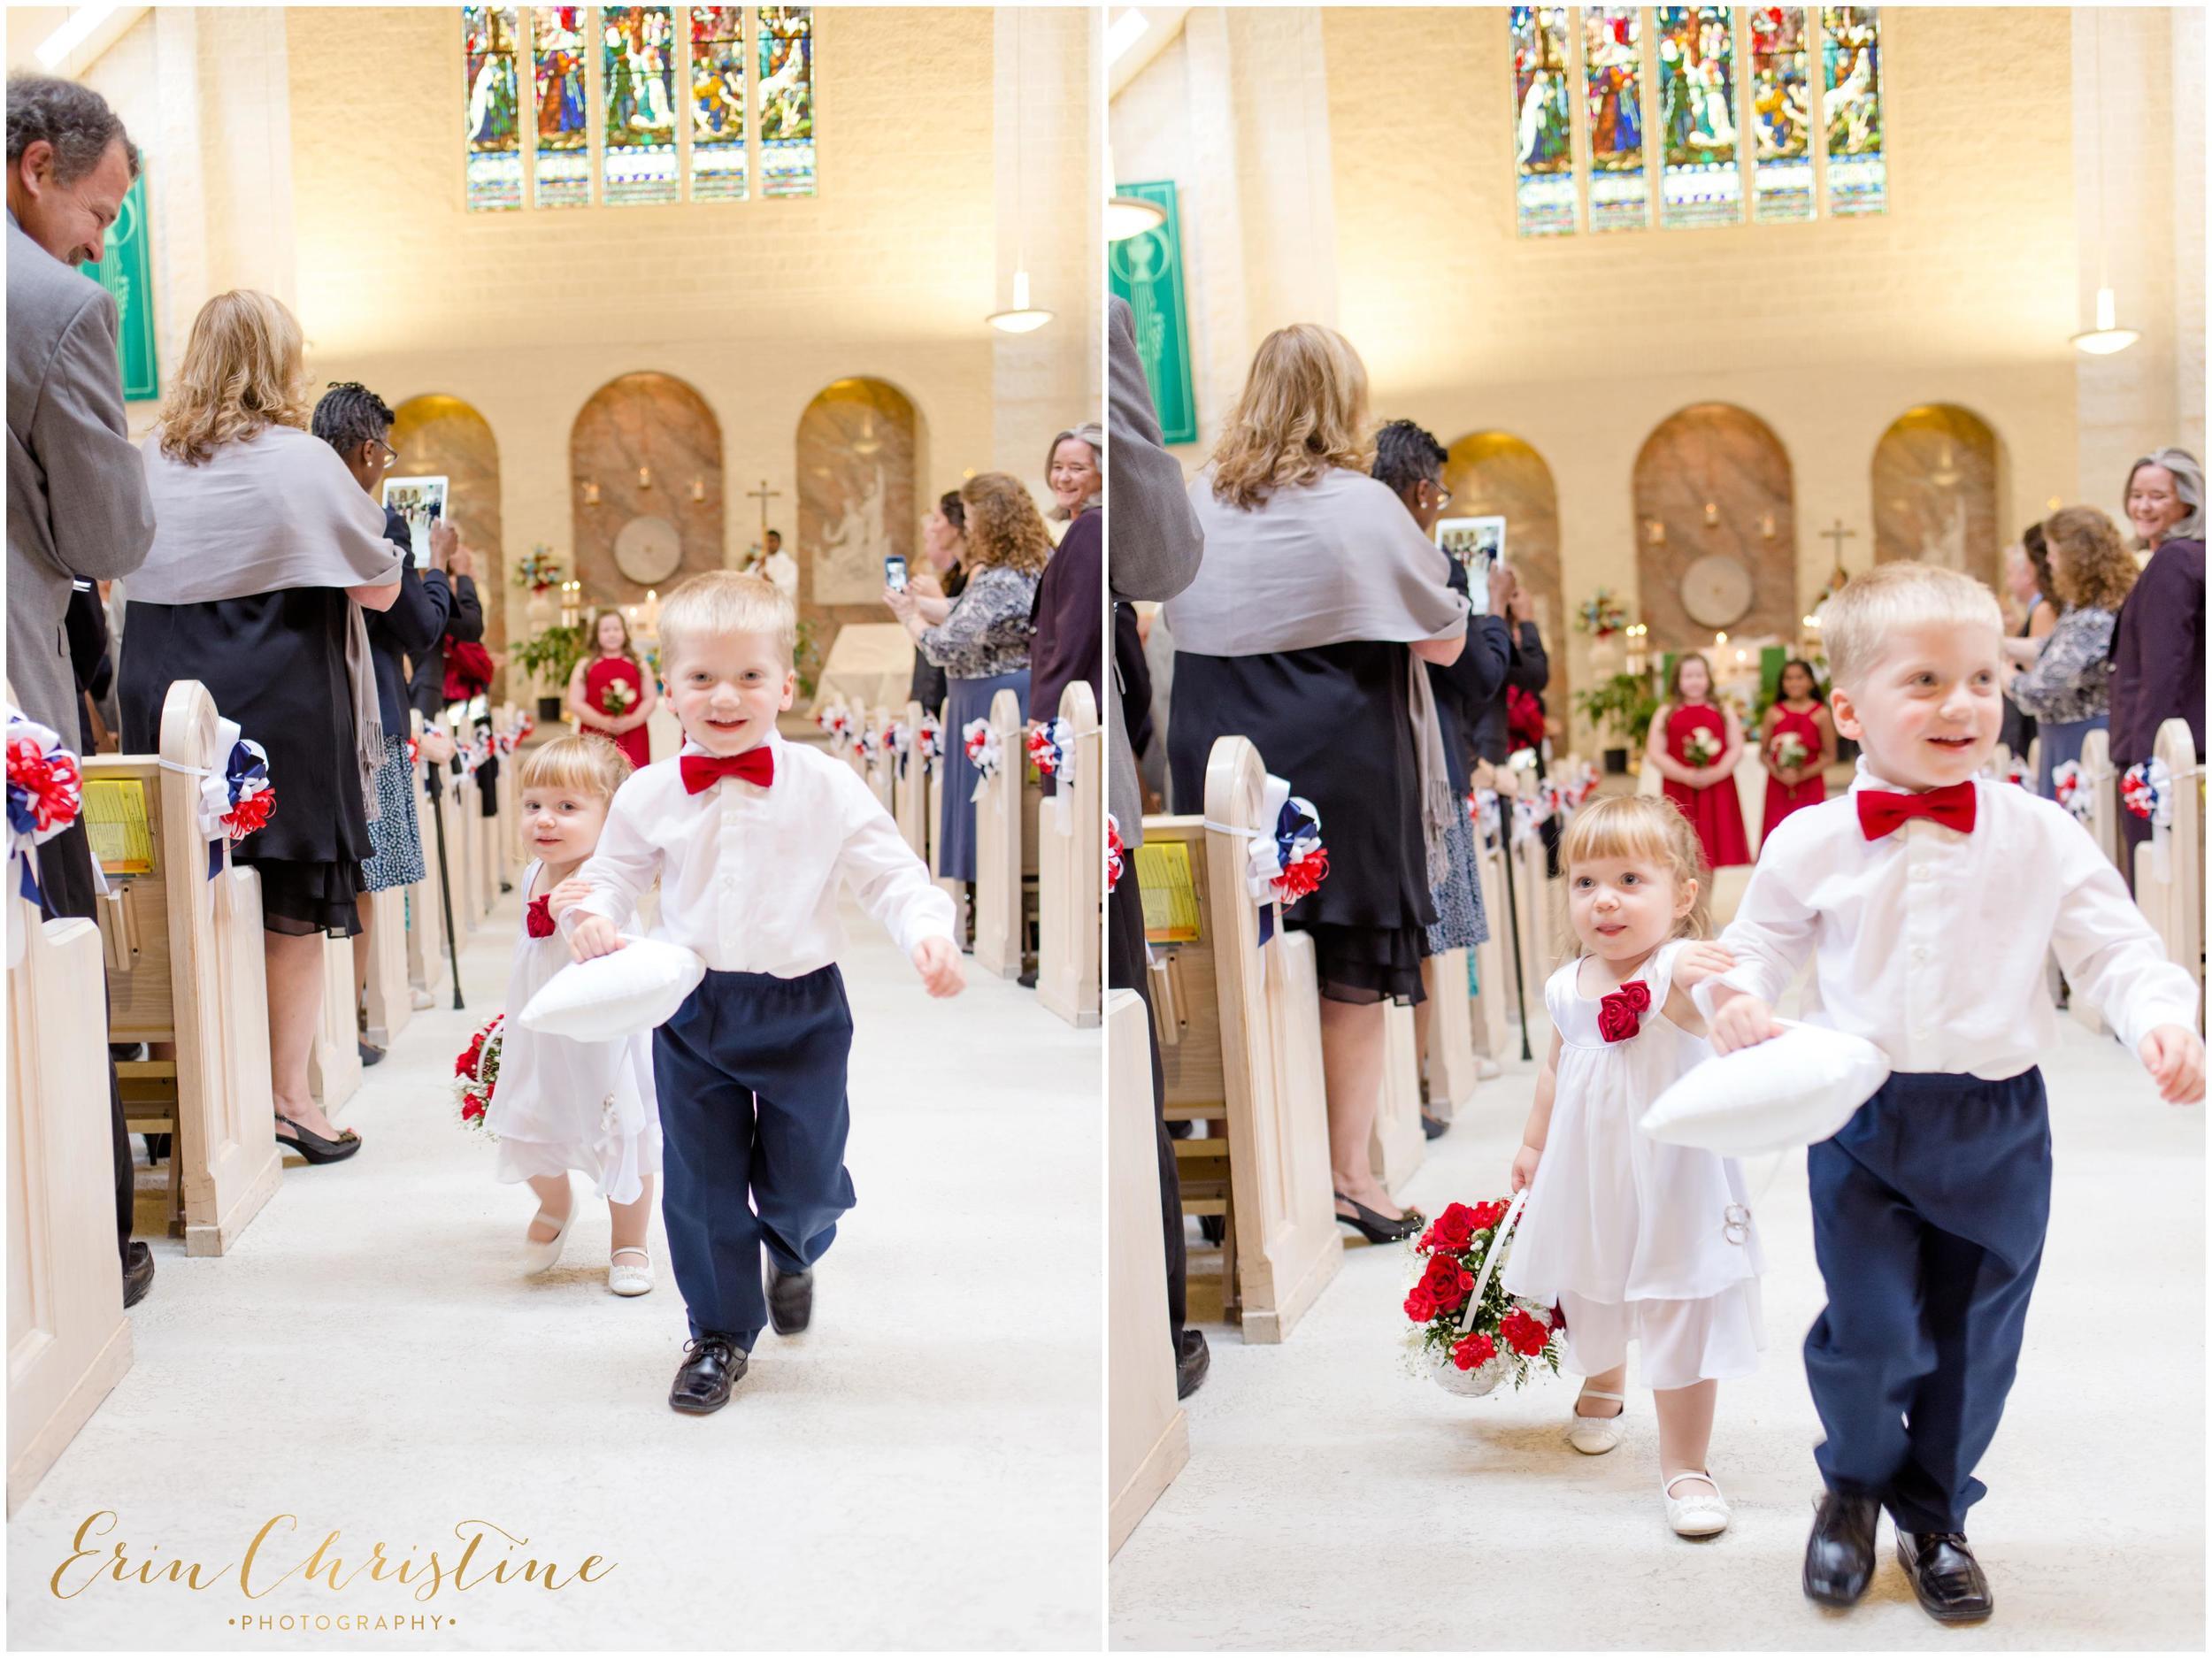 Catholic Ceremony Jesus The Good Shephered-9183.jpg